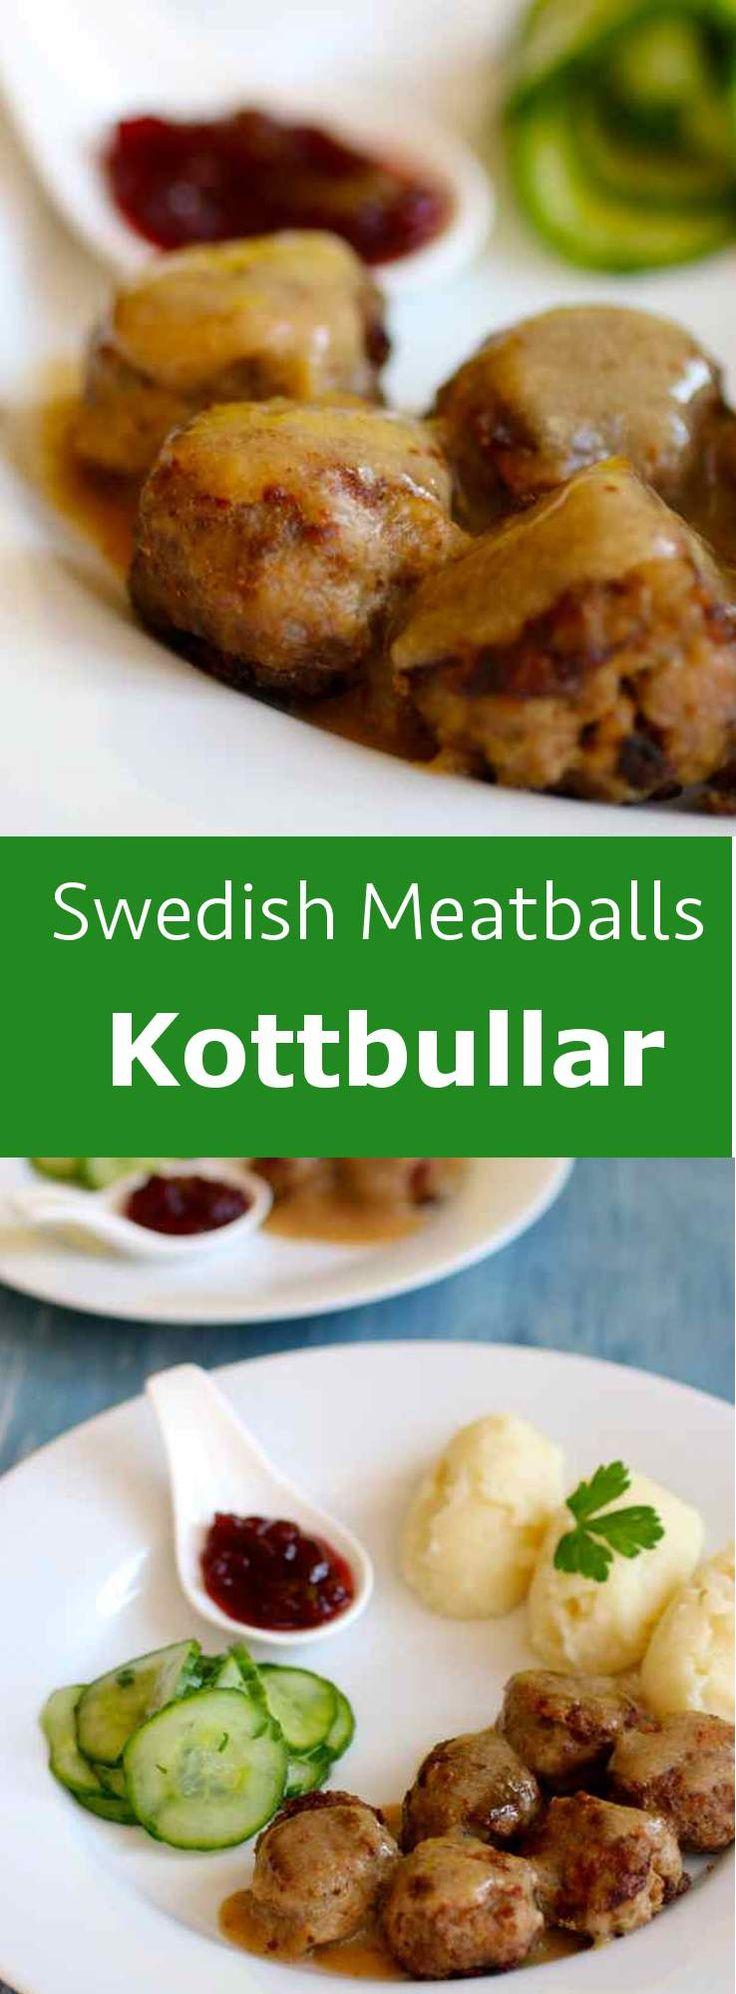 how to cook ikea swedish meatballs